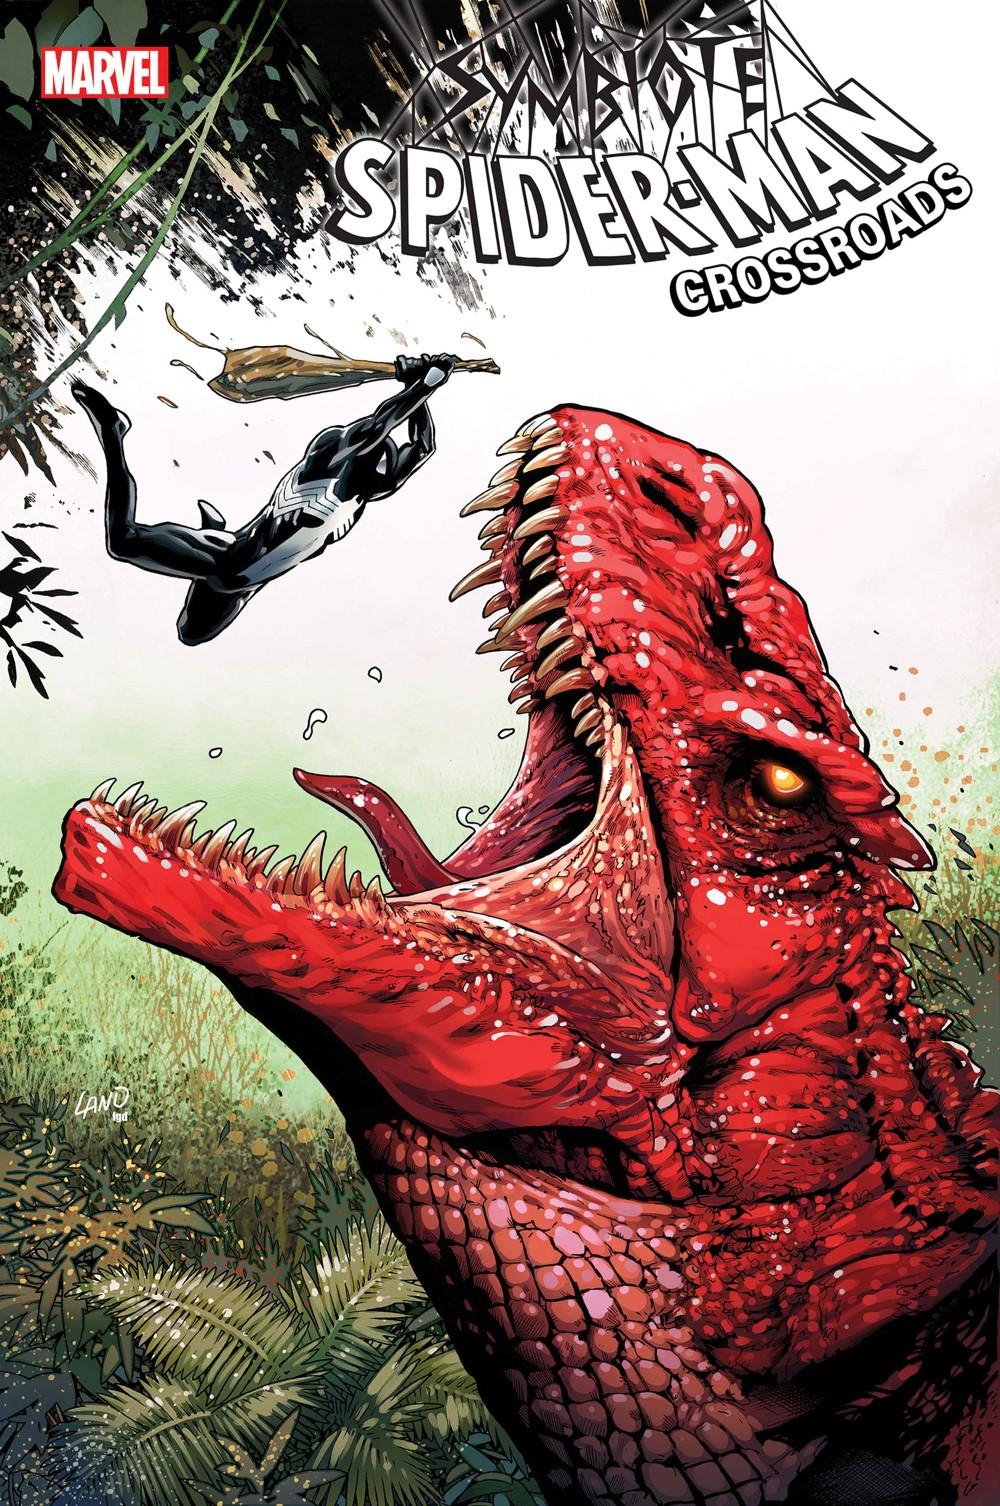 SYMBIOTESMCR2021003_cov Marvel Comics September 2021 Solicitations